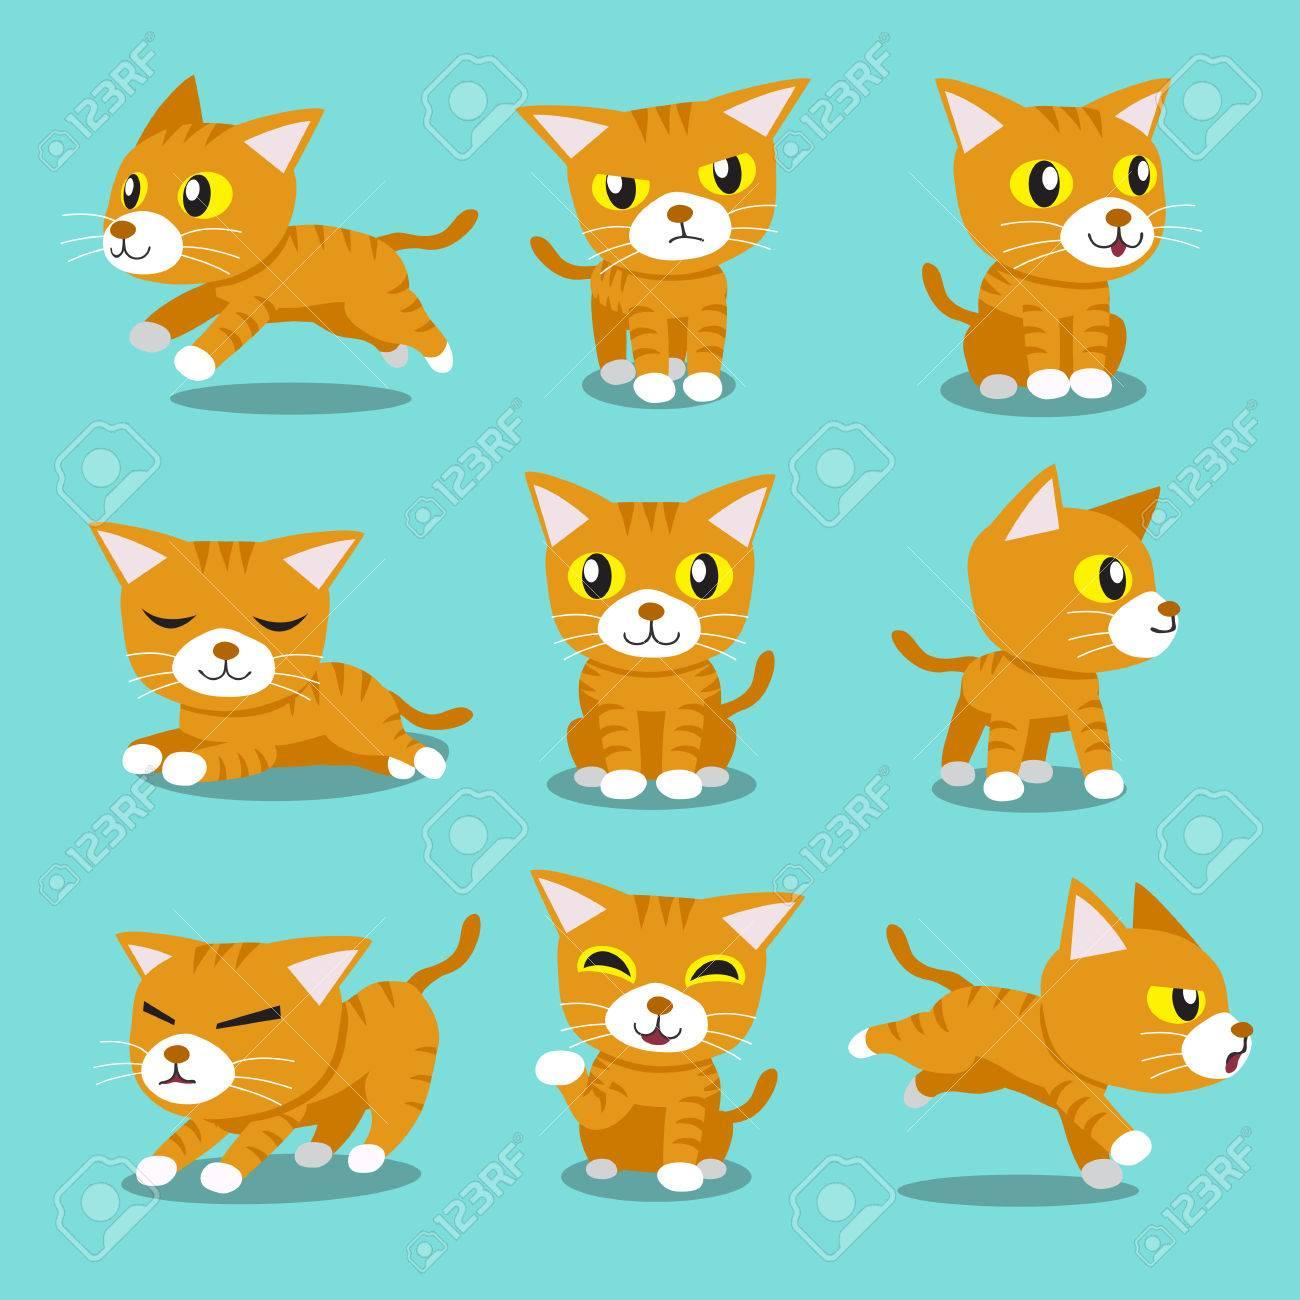 Cartoon character orange cat poses - 53668839